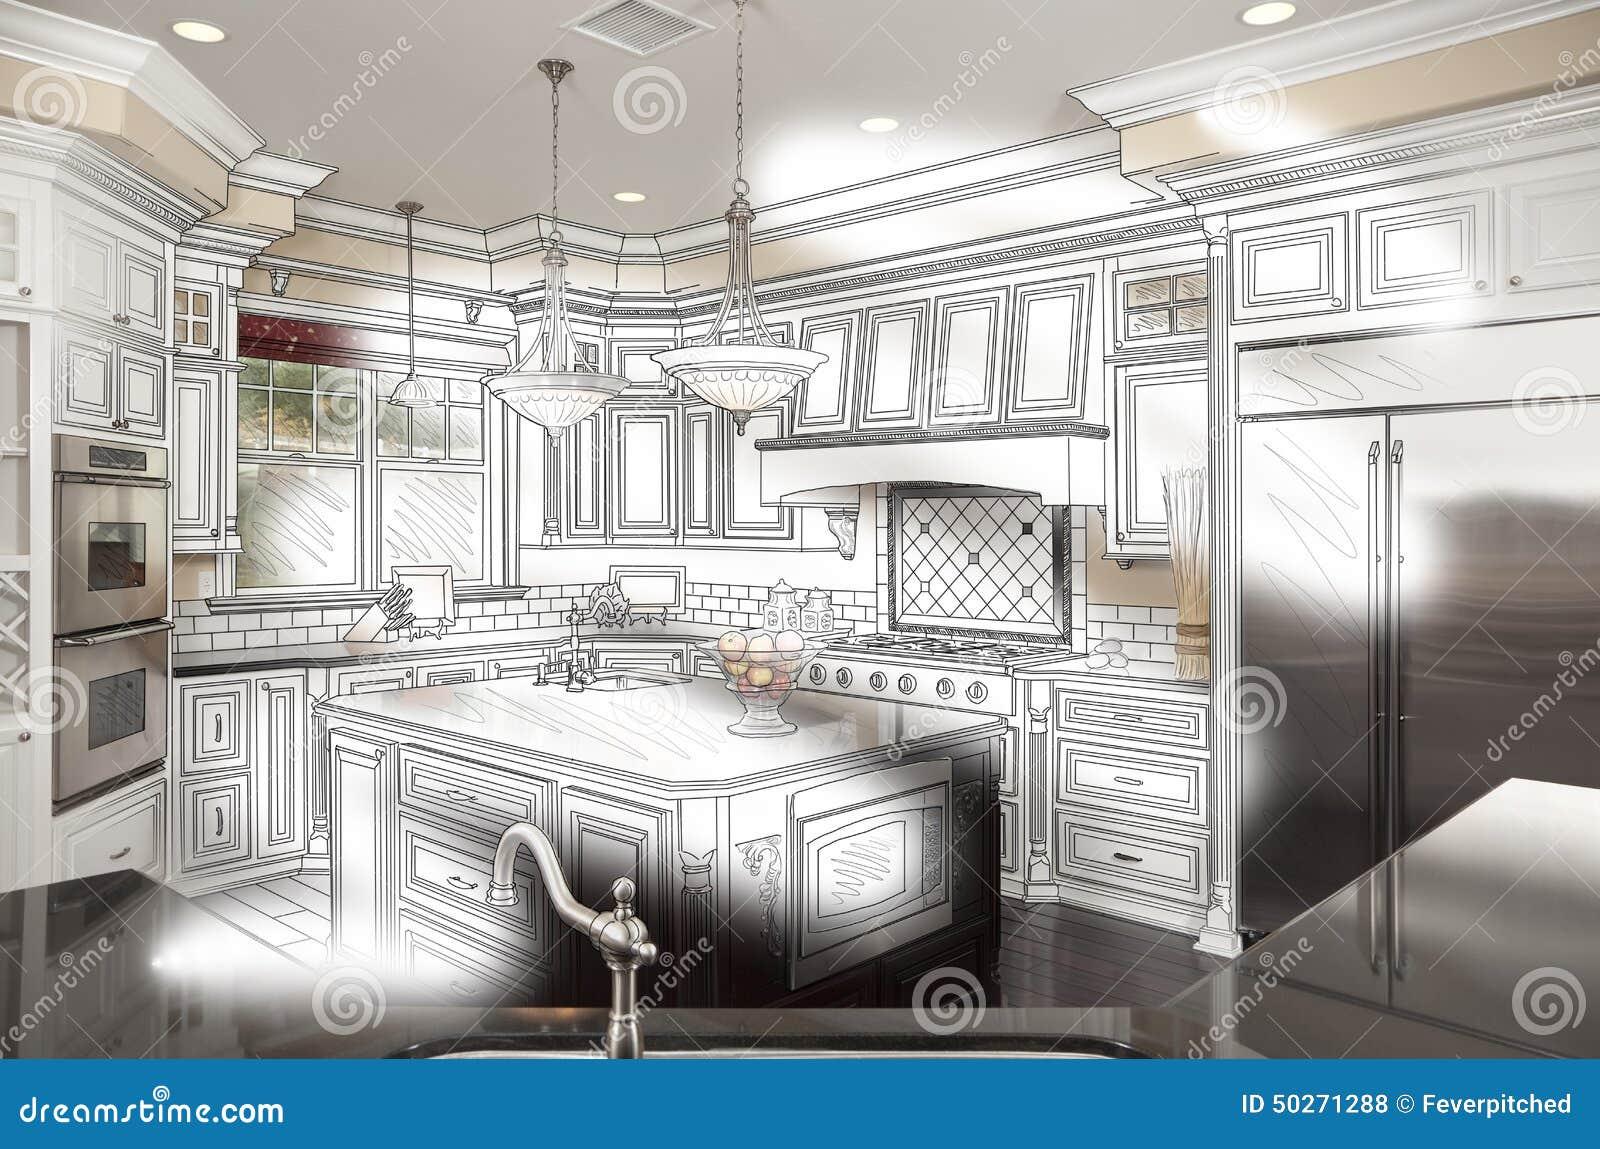 Beautiful Custom Kitchen Design Drawing and Photo Combination